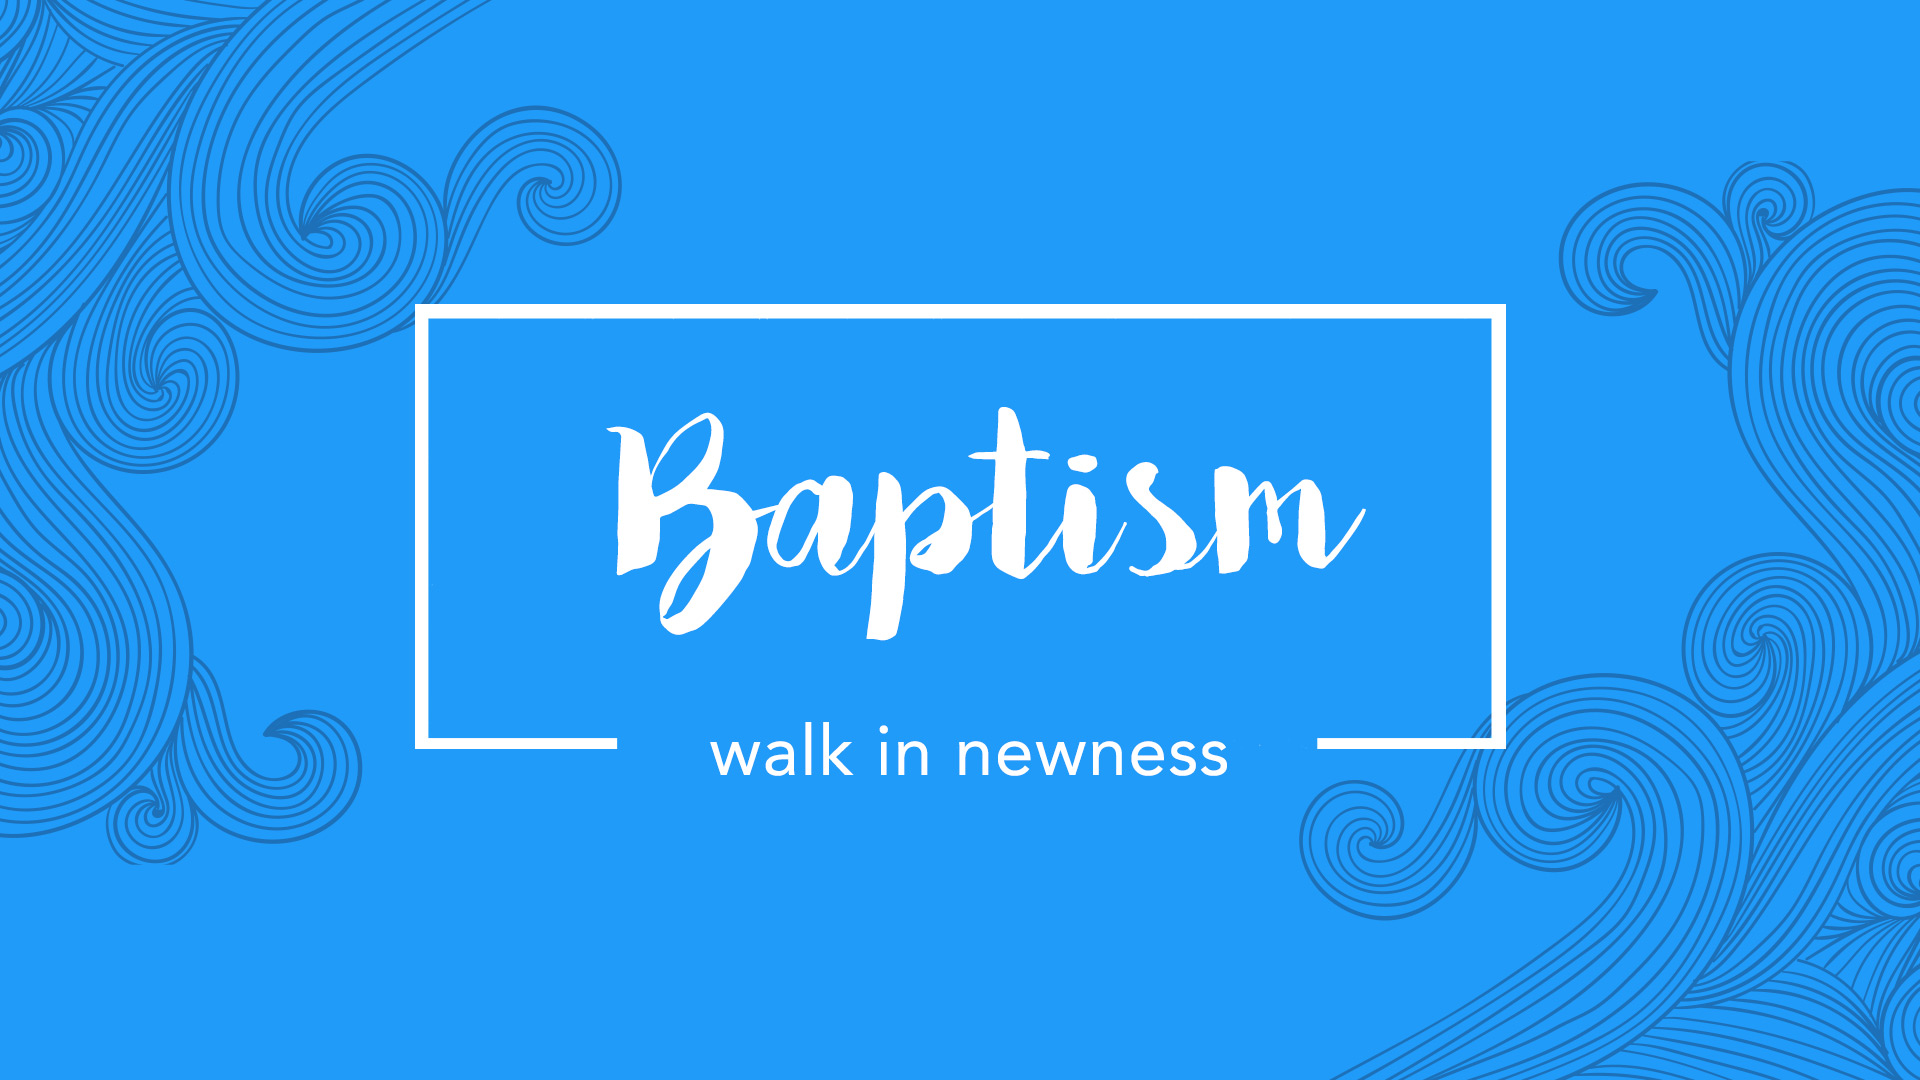 Baptismnew